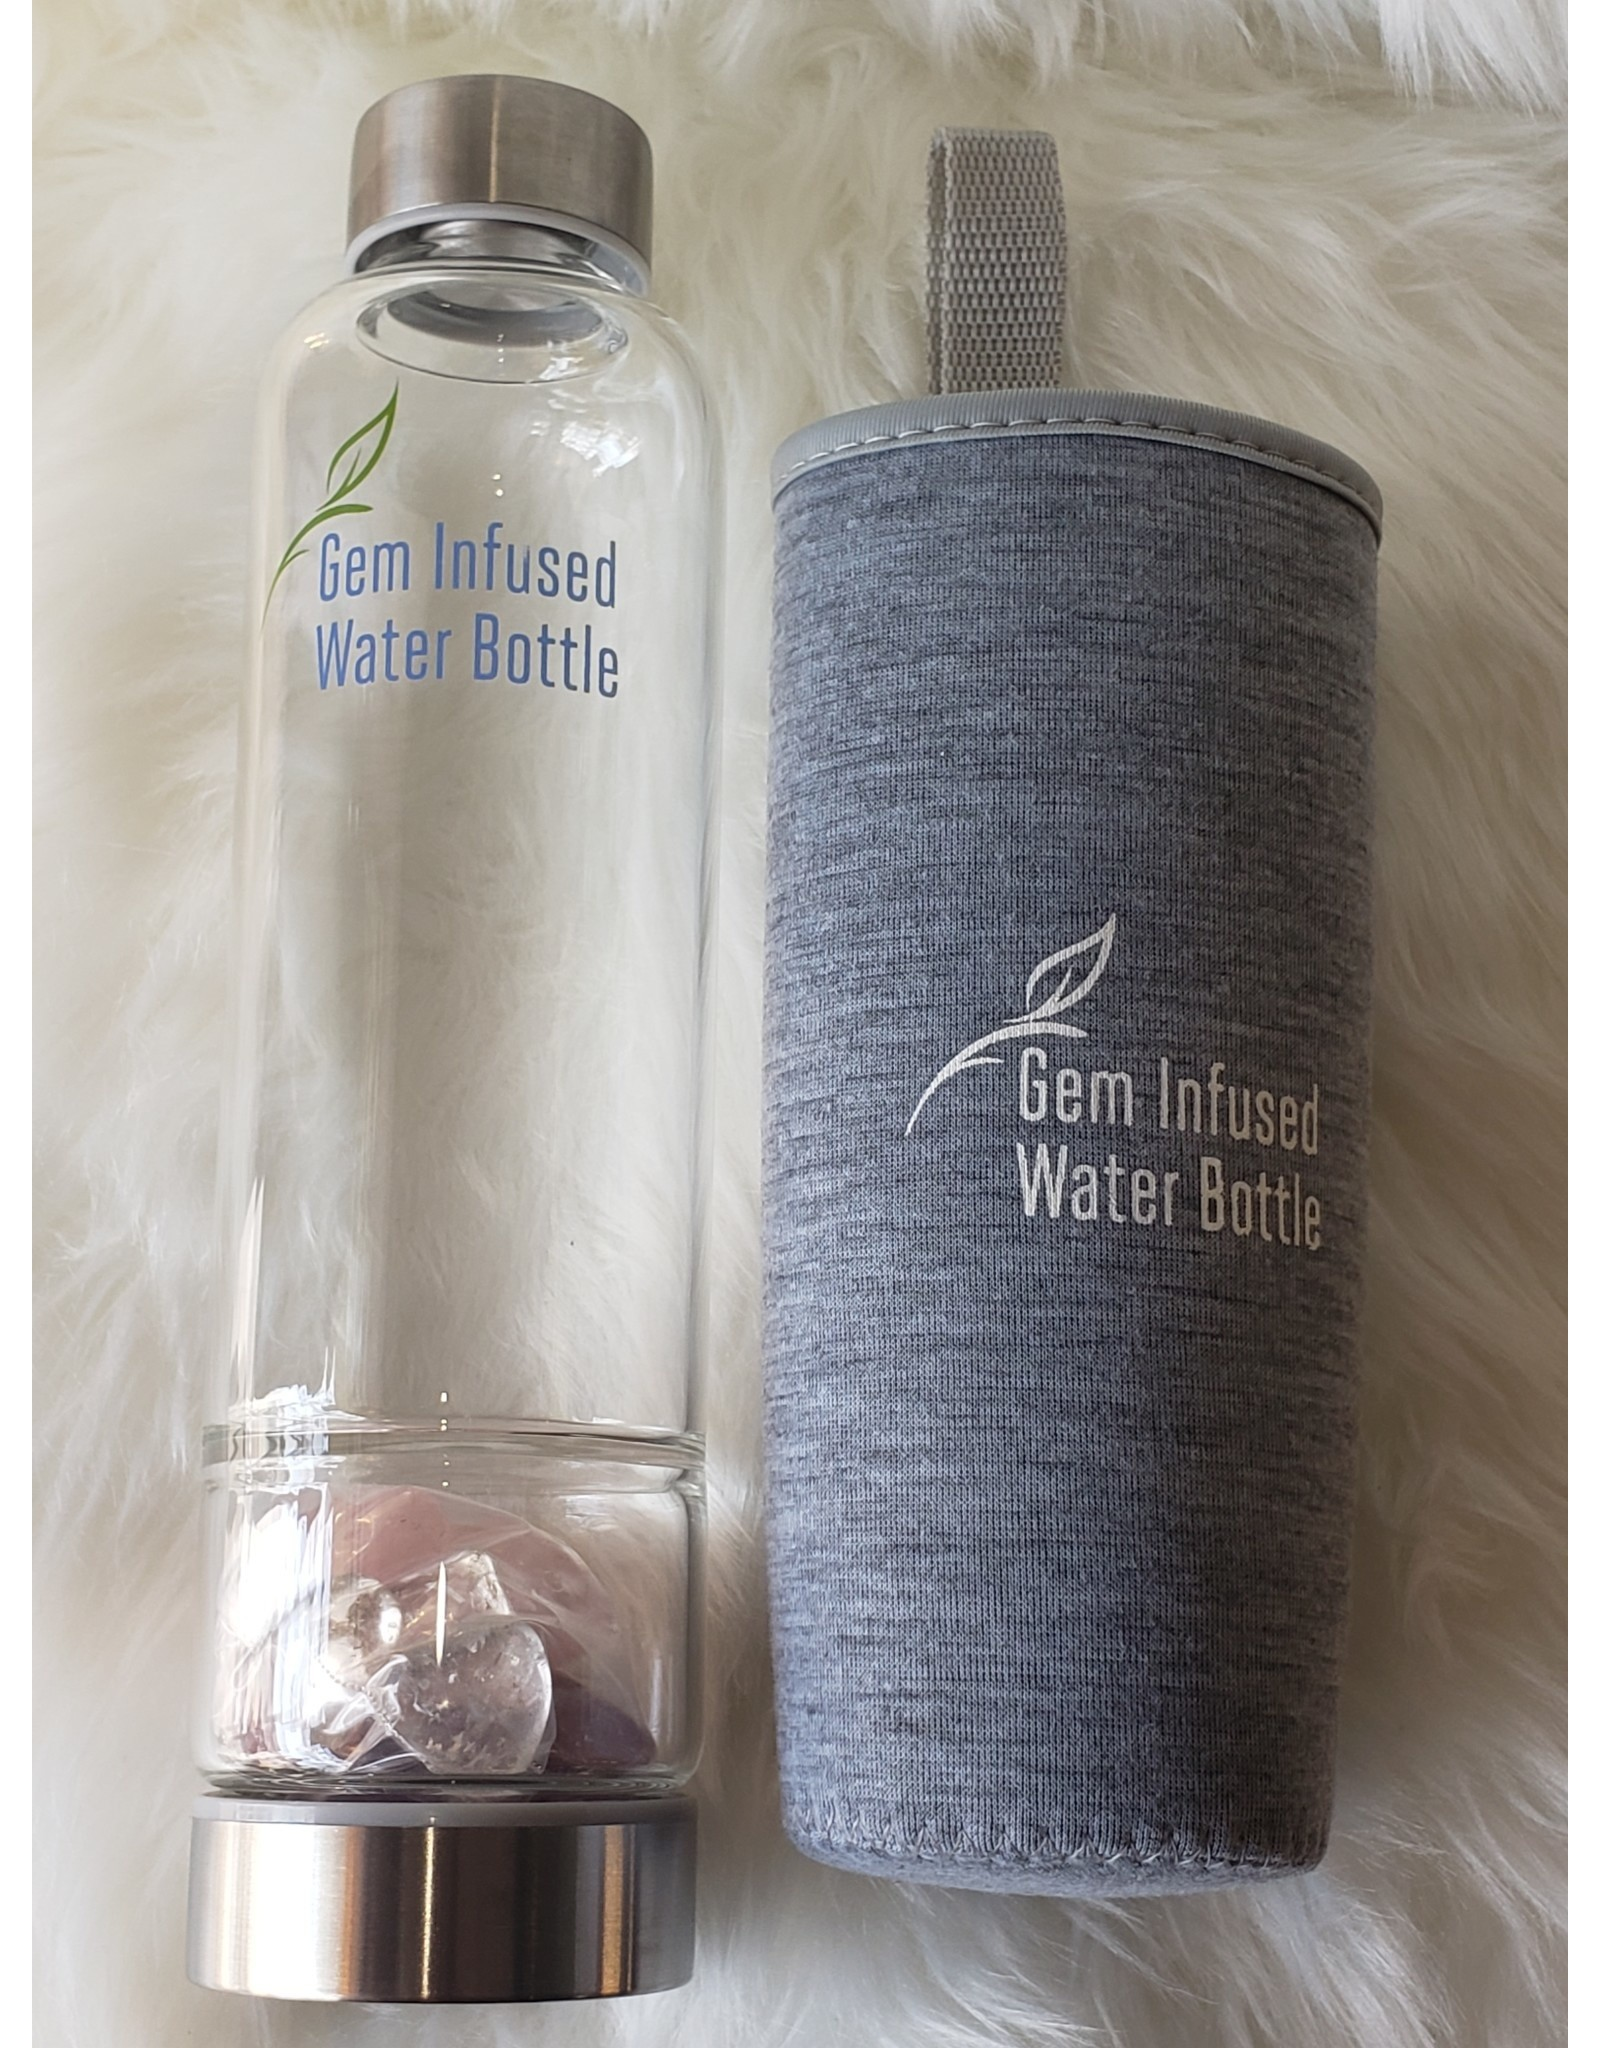 Gem Infused Water Bottle